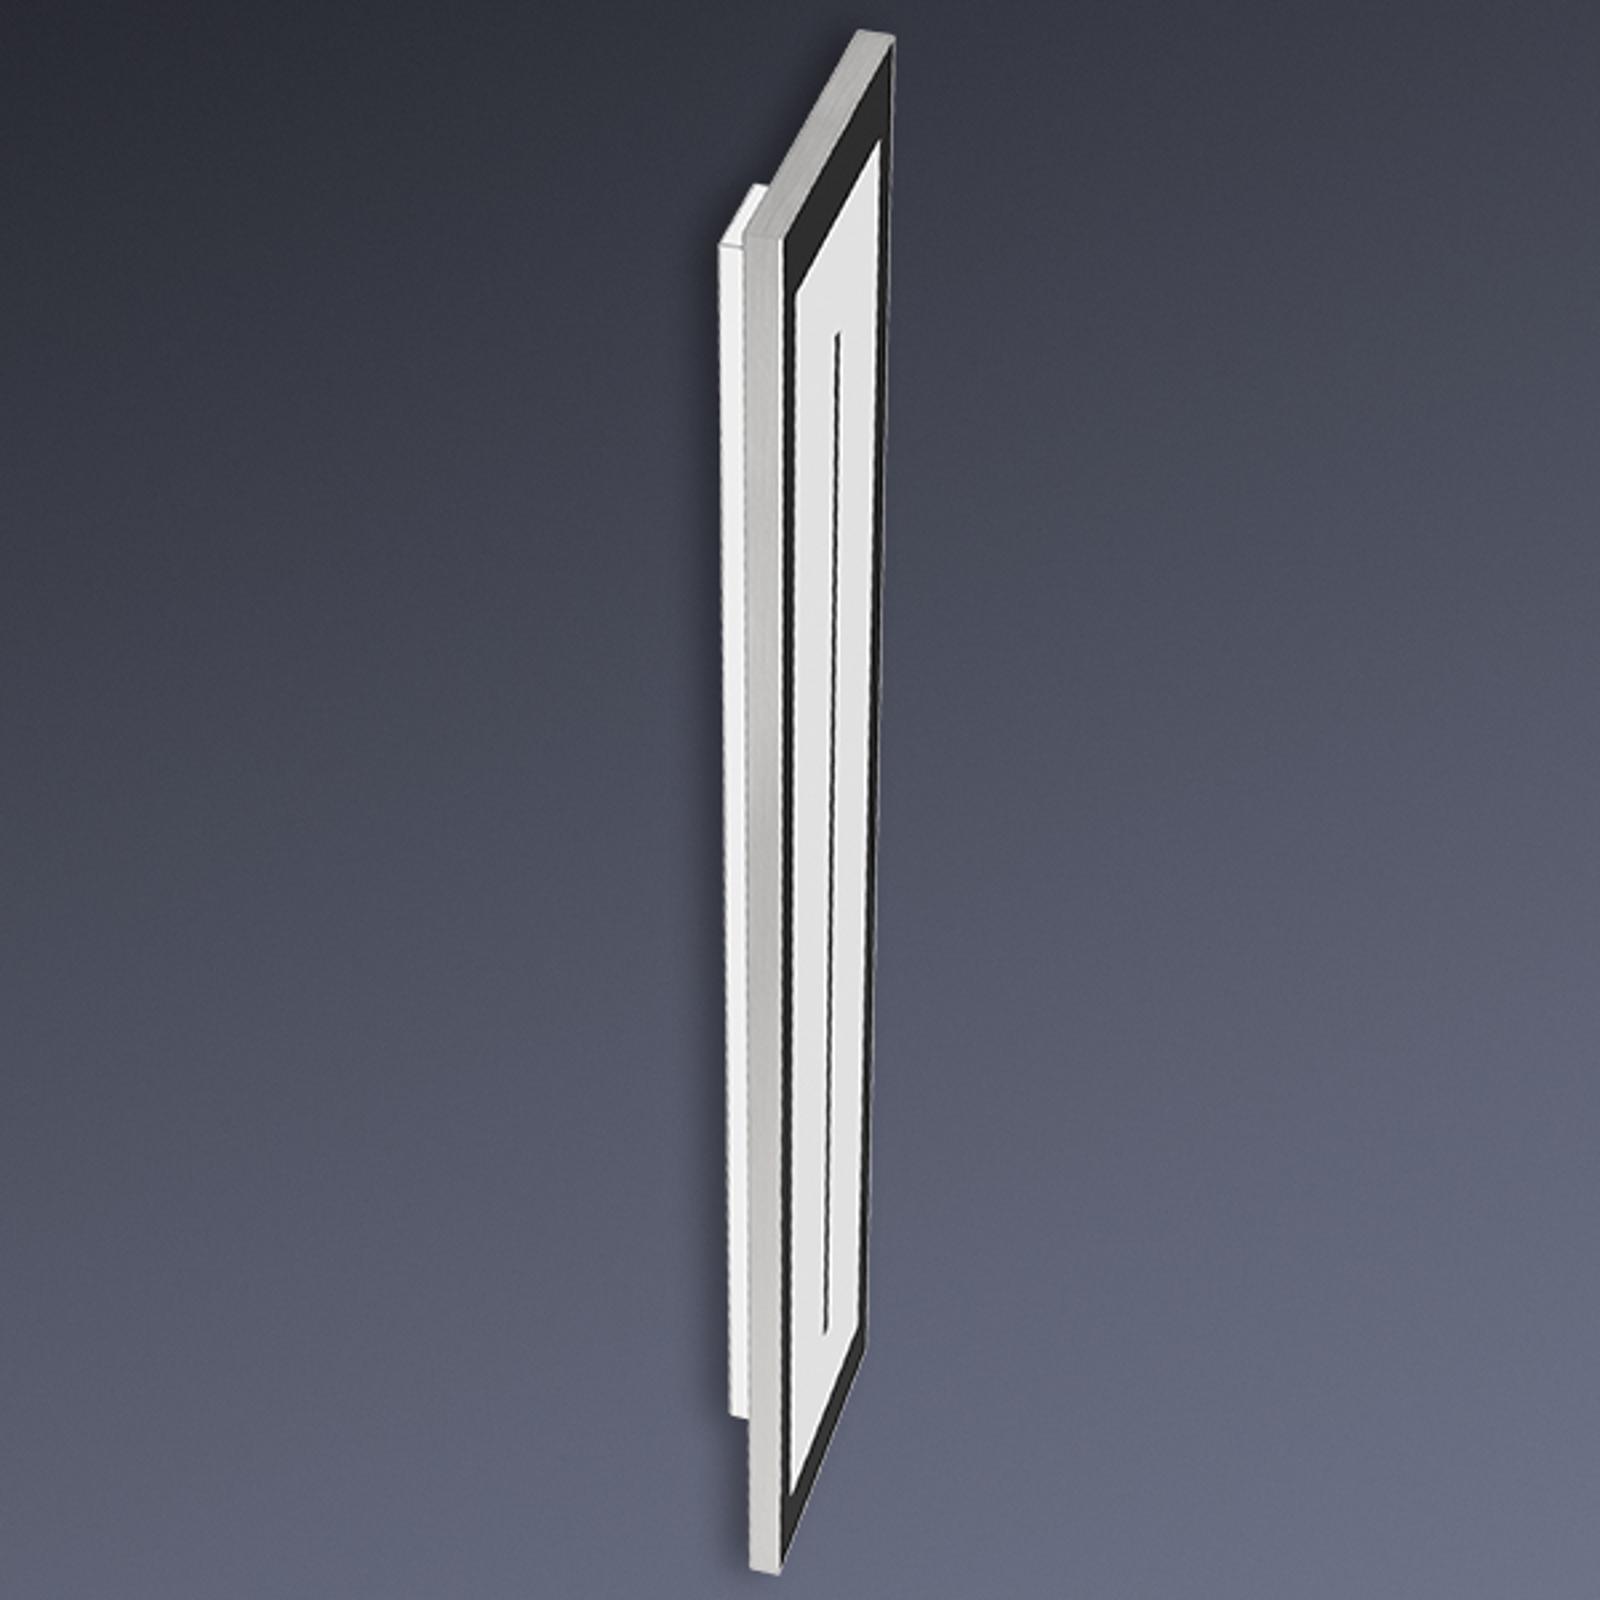 Lámpara LED de pared Zen - 60 cm de altura